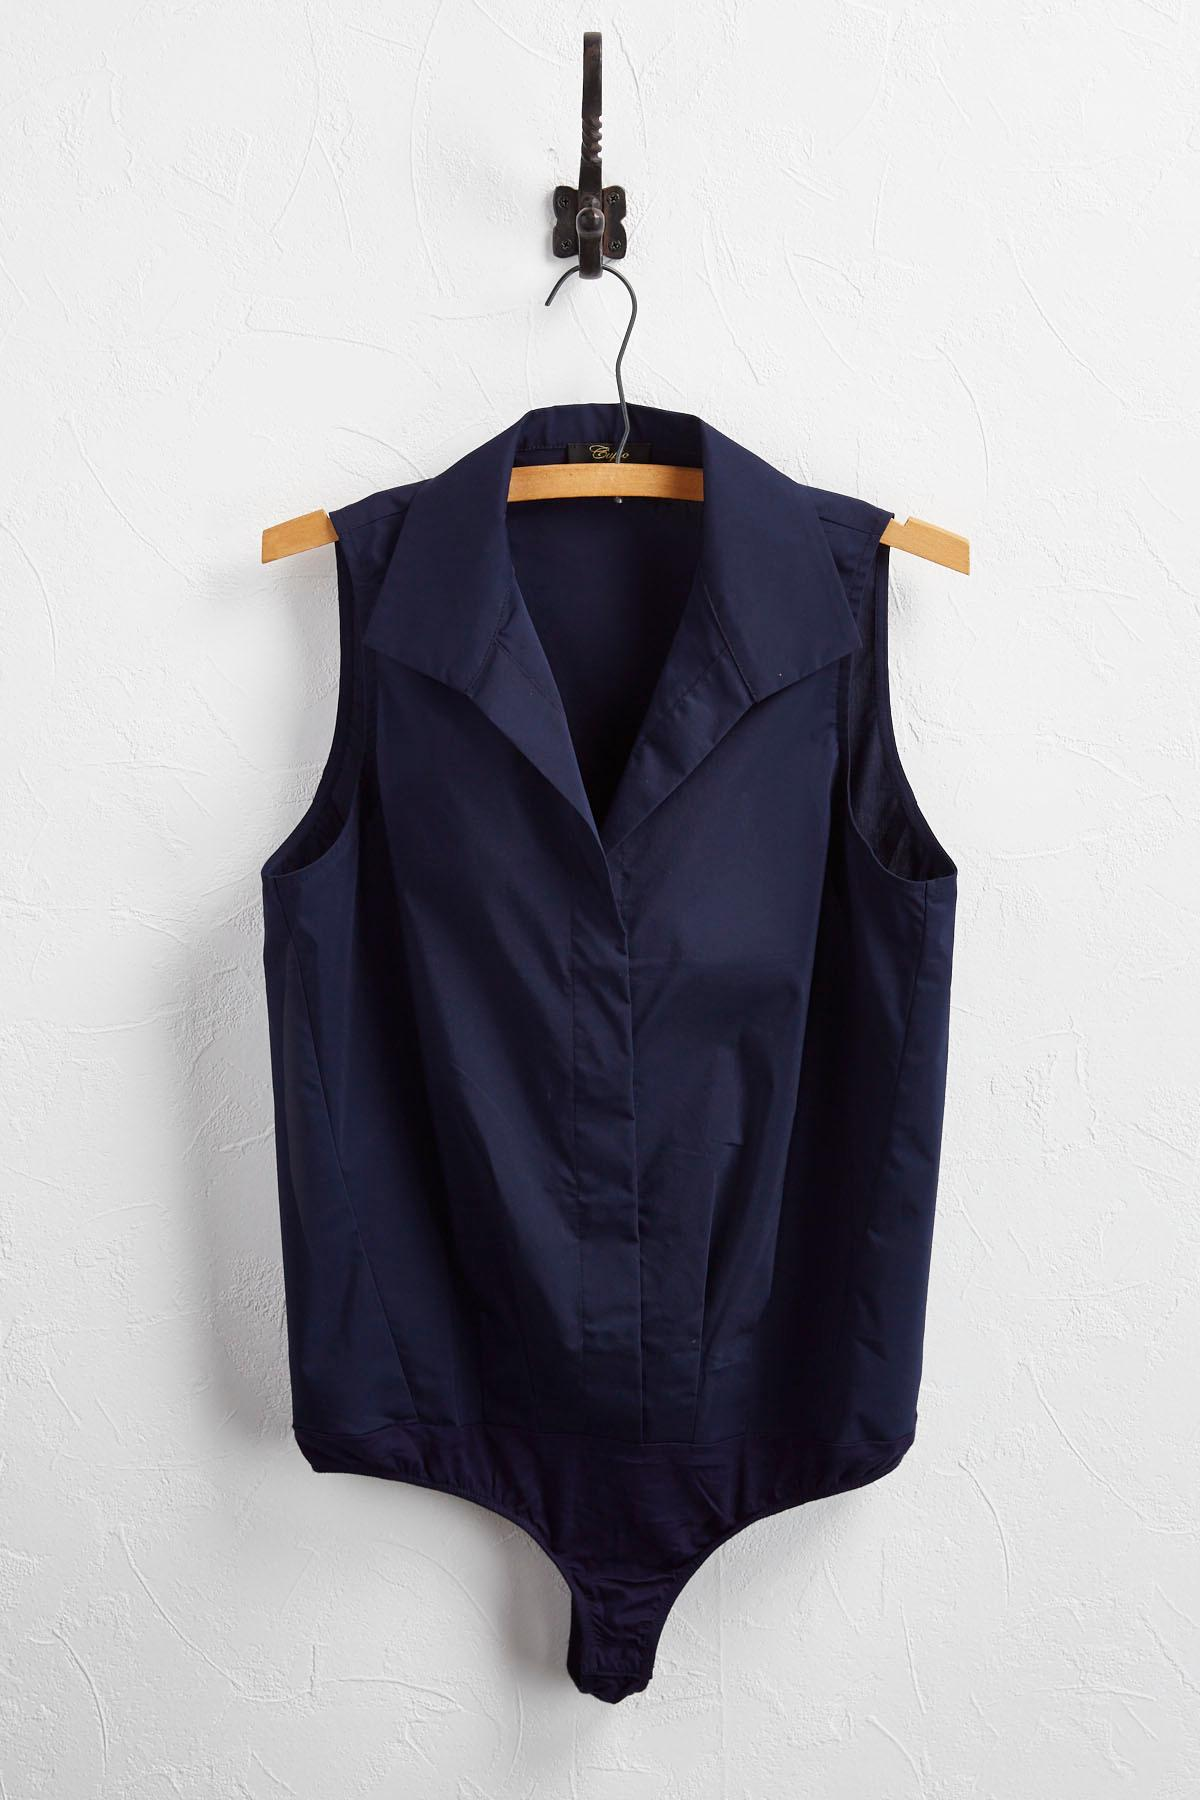 Collared Snap Button Bodysuit